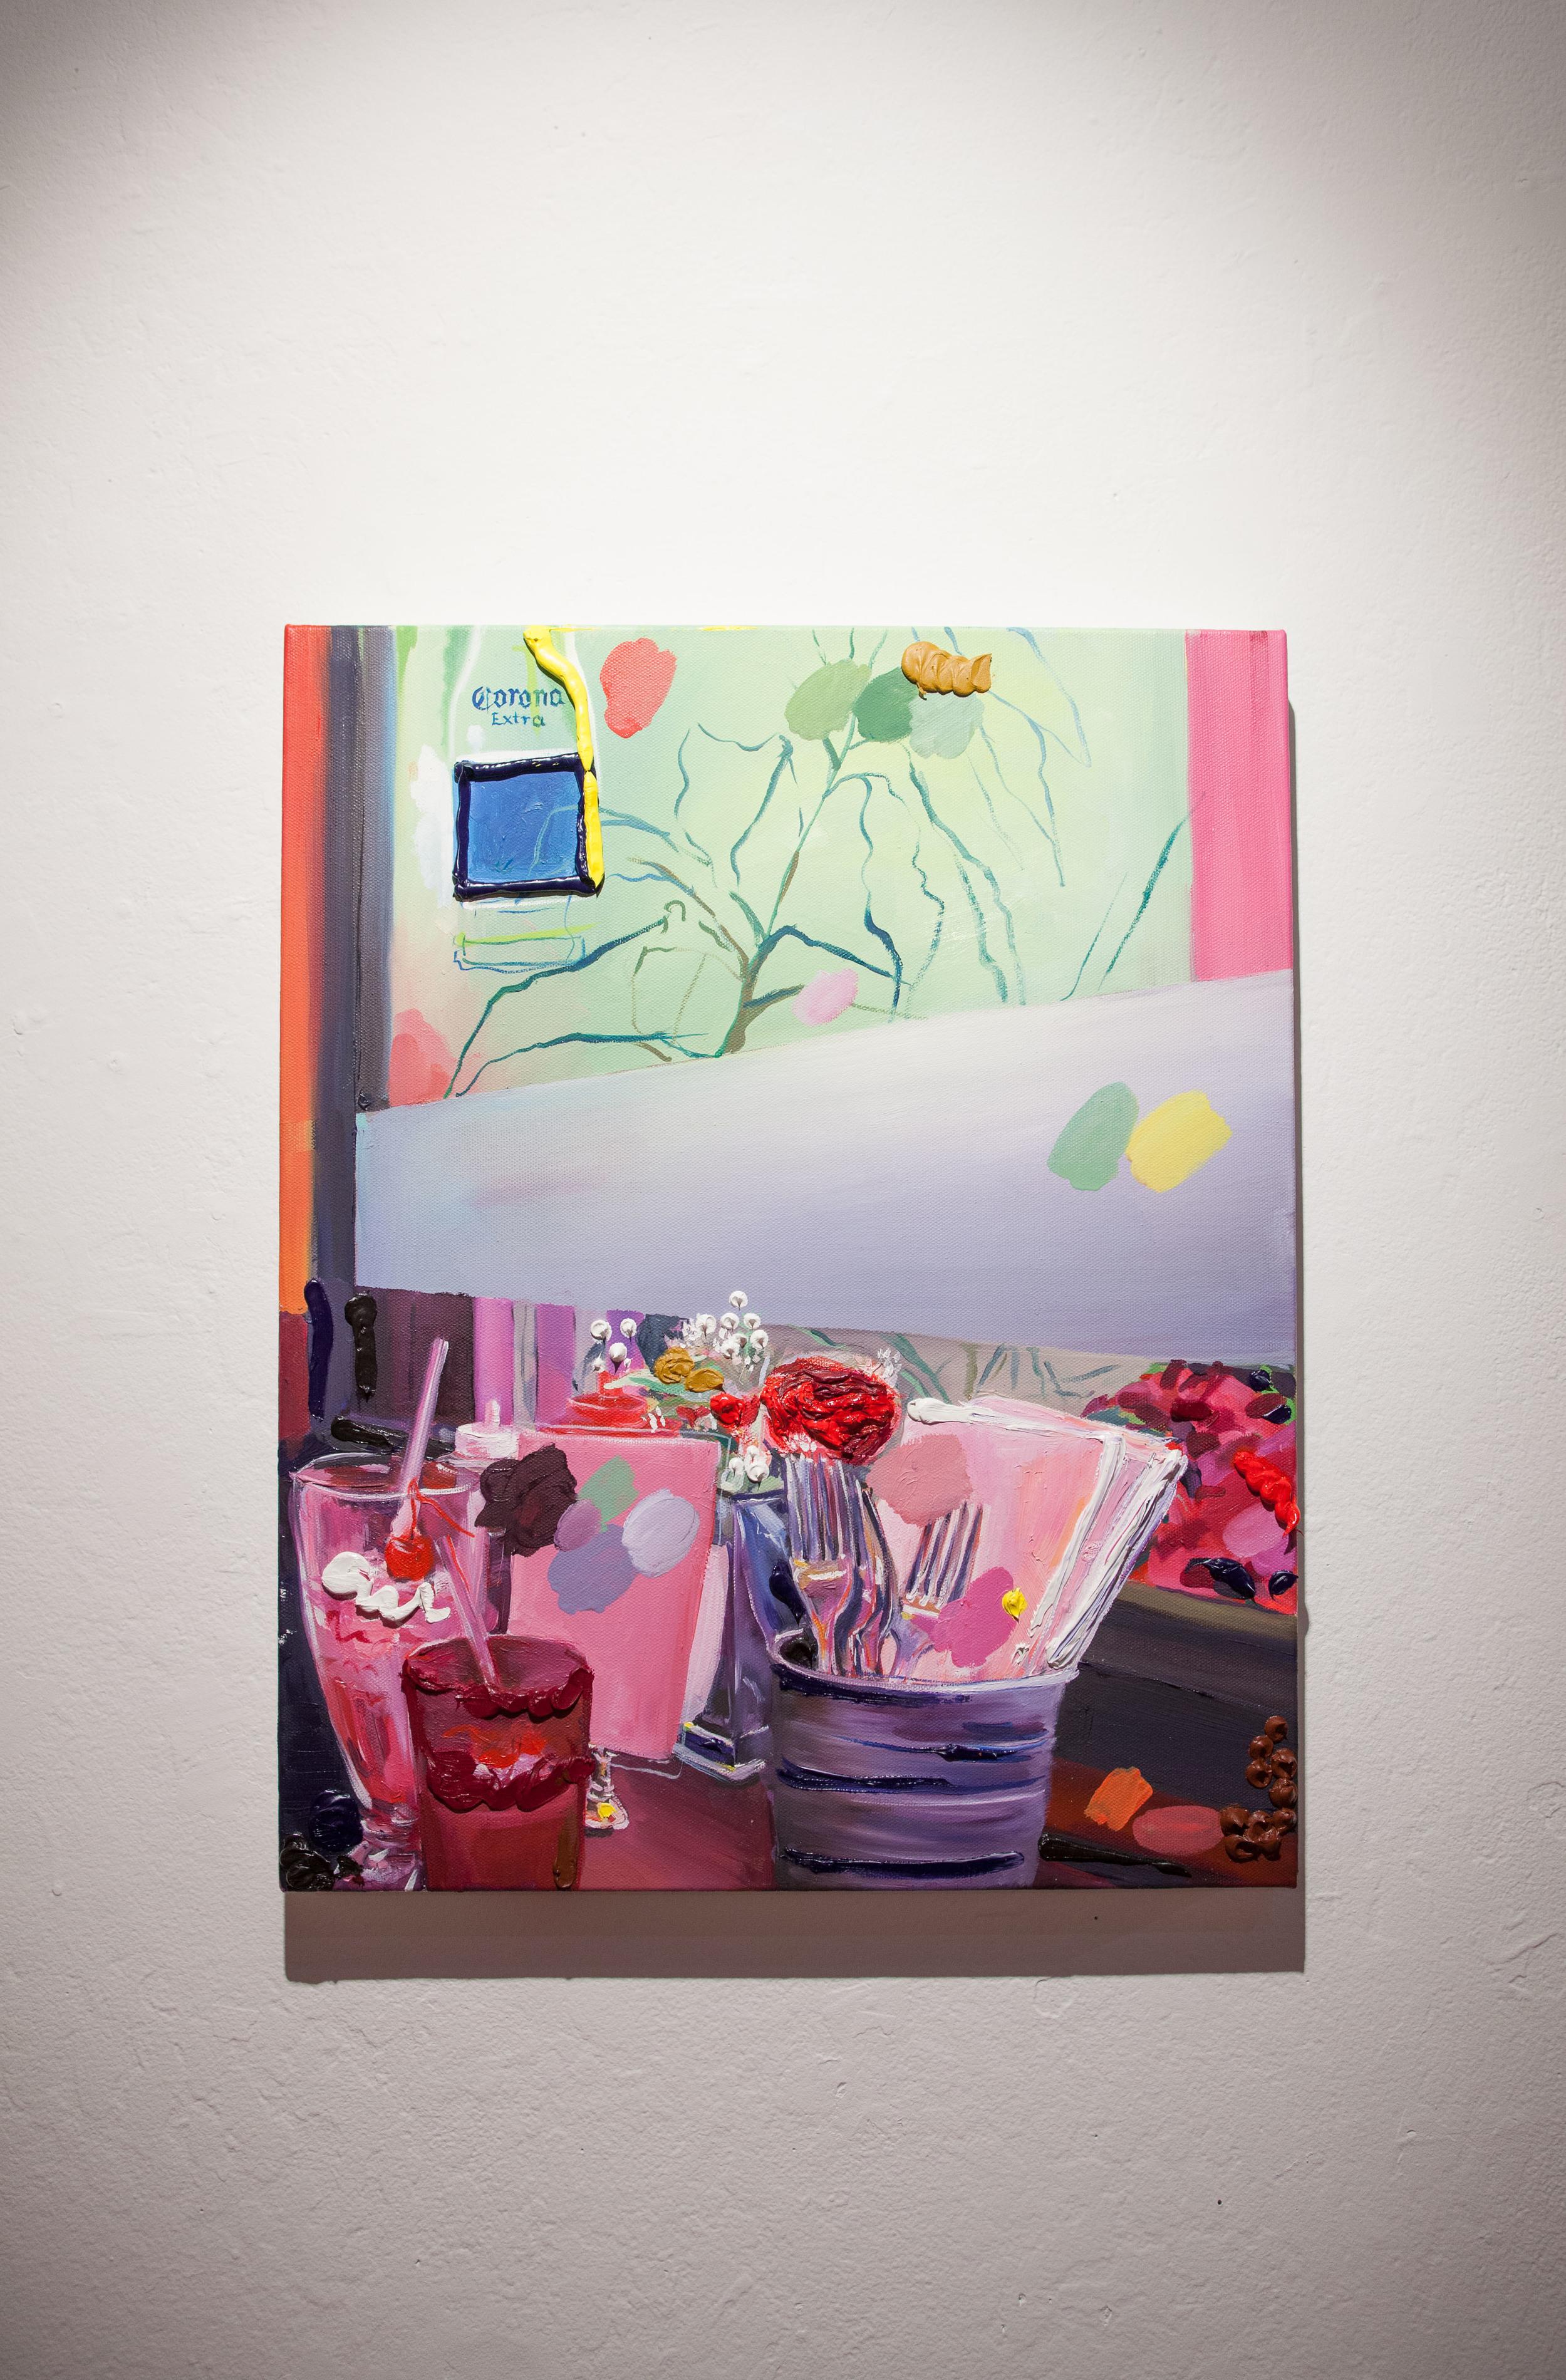 Delaney Lee,  Twelve , 2015  Oil on canvas, 16 x 20 in.